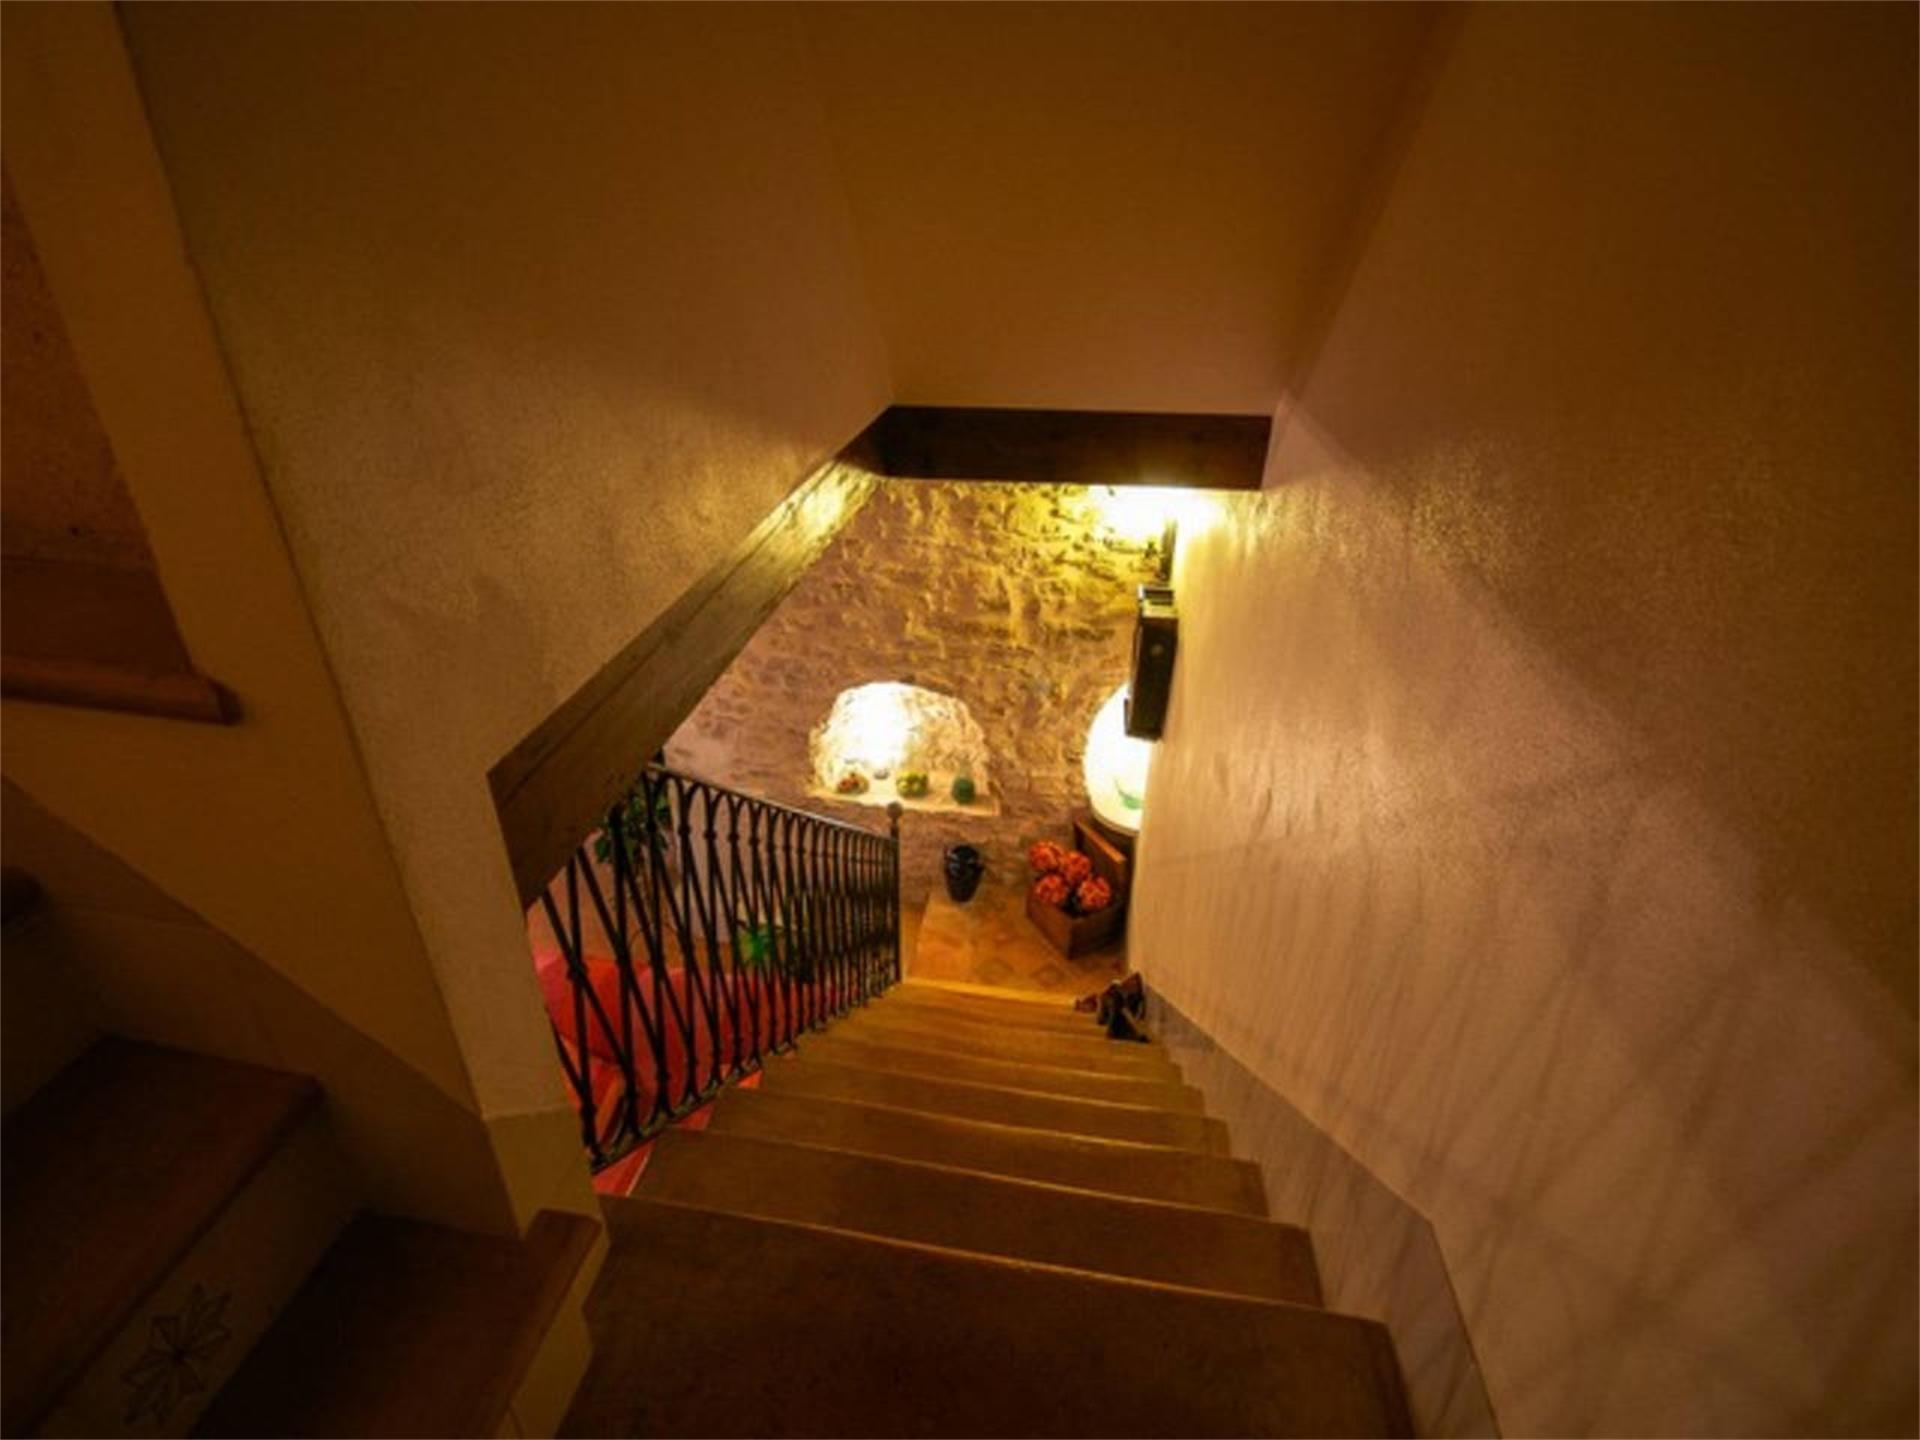 Location Maison jumelée  Carrer lluna. Santa margalida